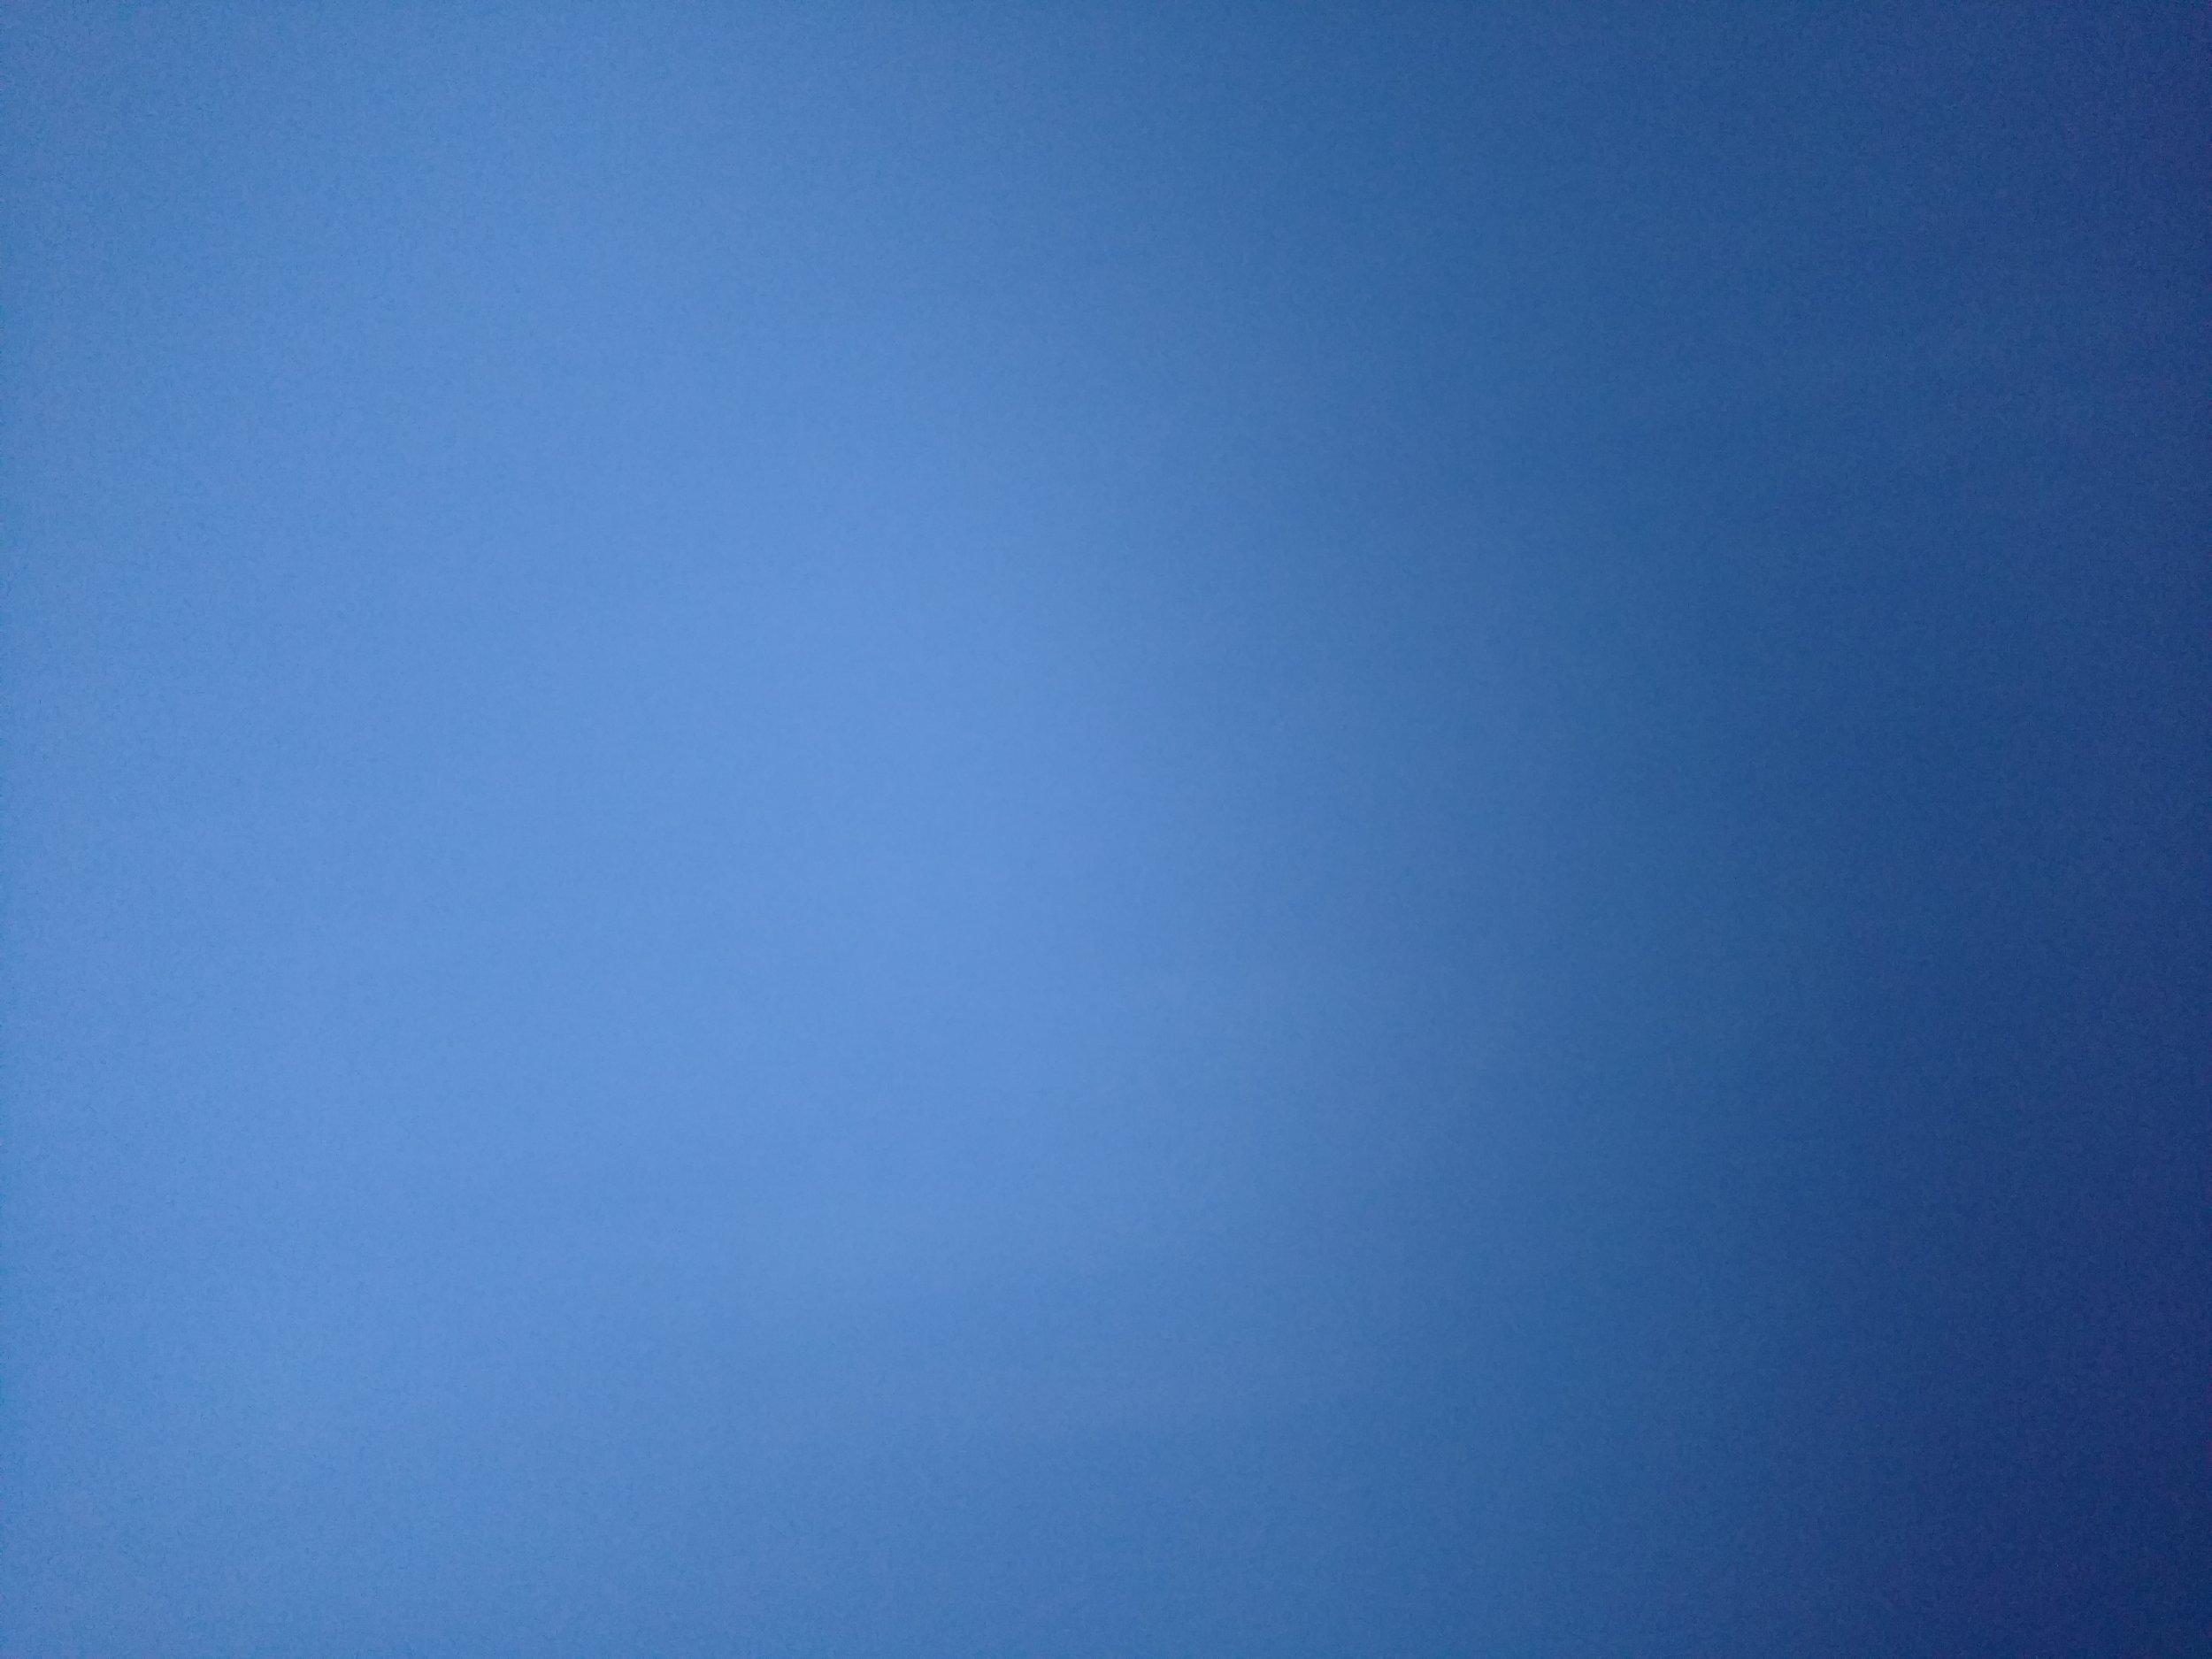 willroth-co-free-texture-gradient-011.jpg